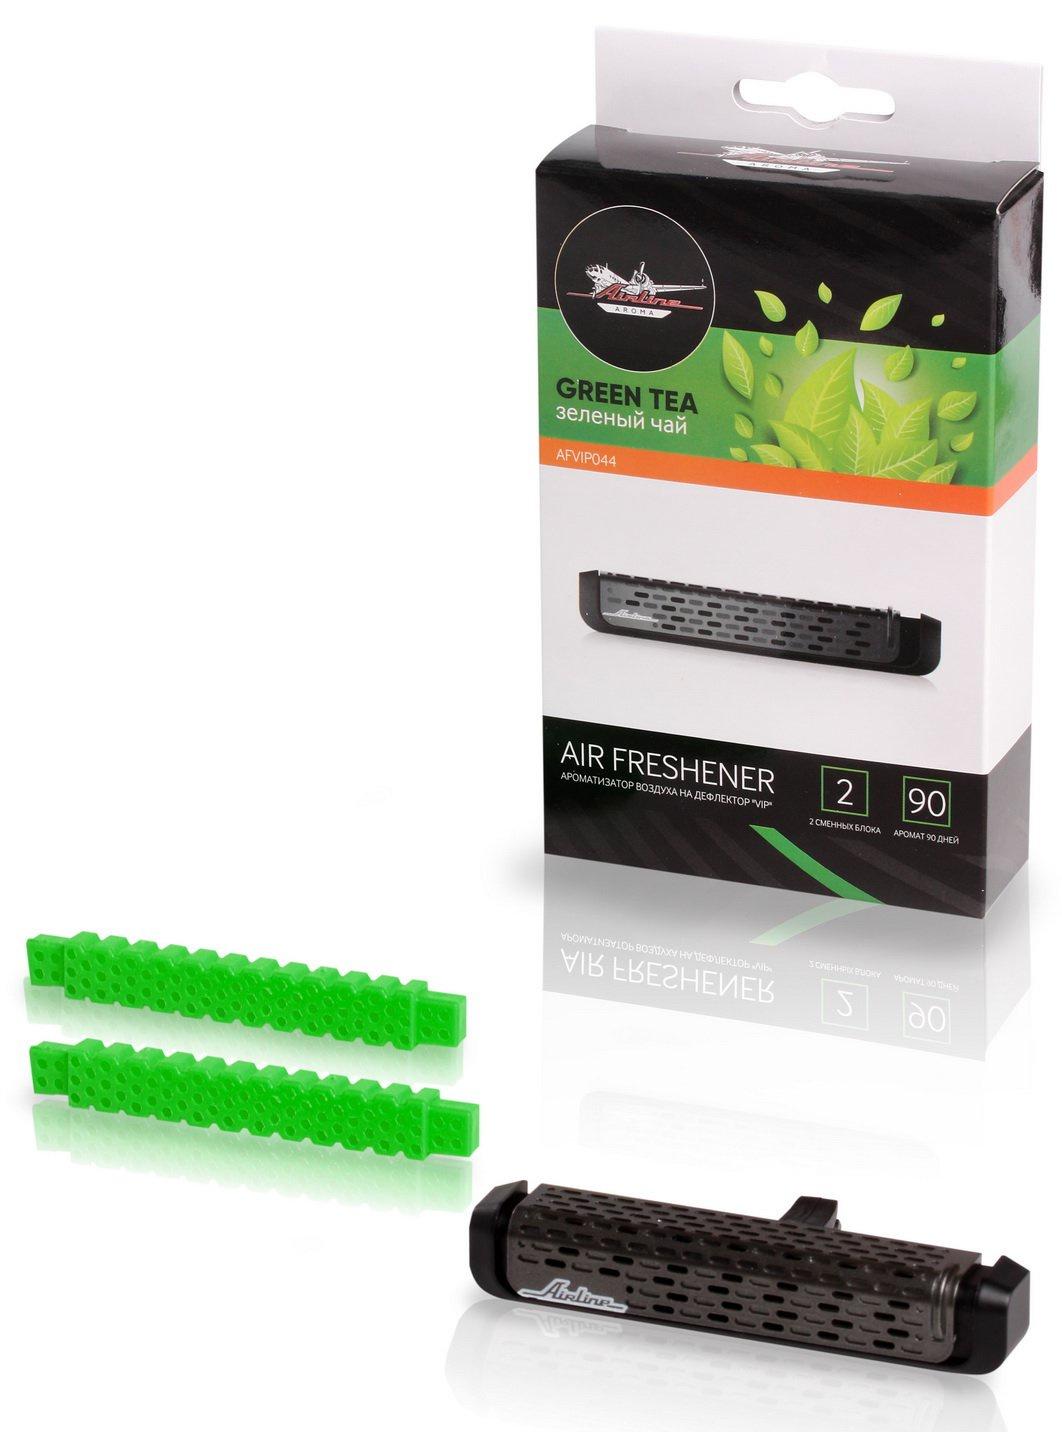 Фото - Ароматизатор на дефлектор VIP зеленый чай (AFVIP044) авто